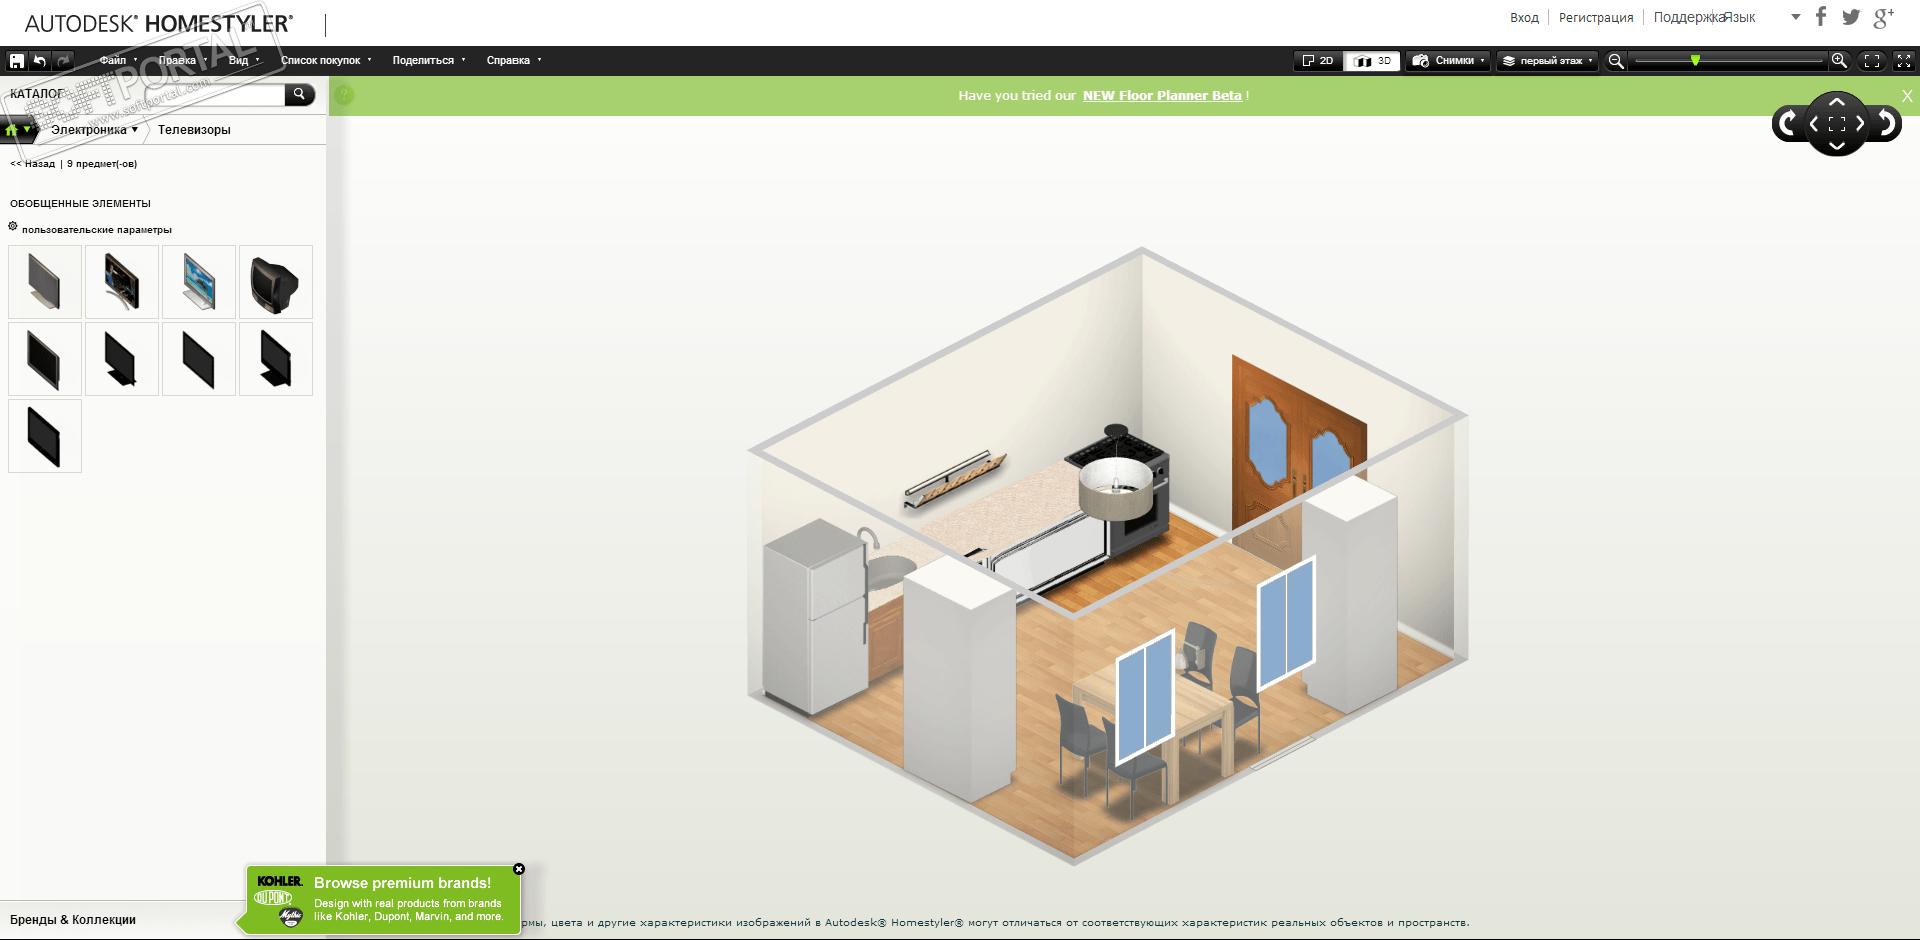 Autodesk homestyler online.